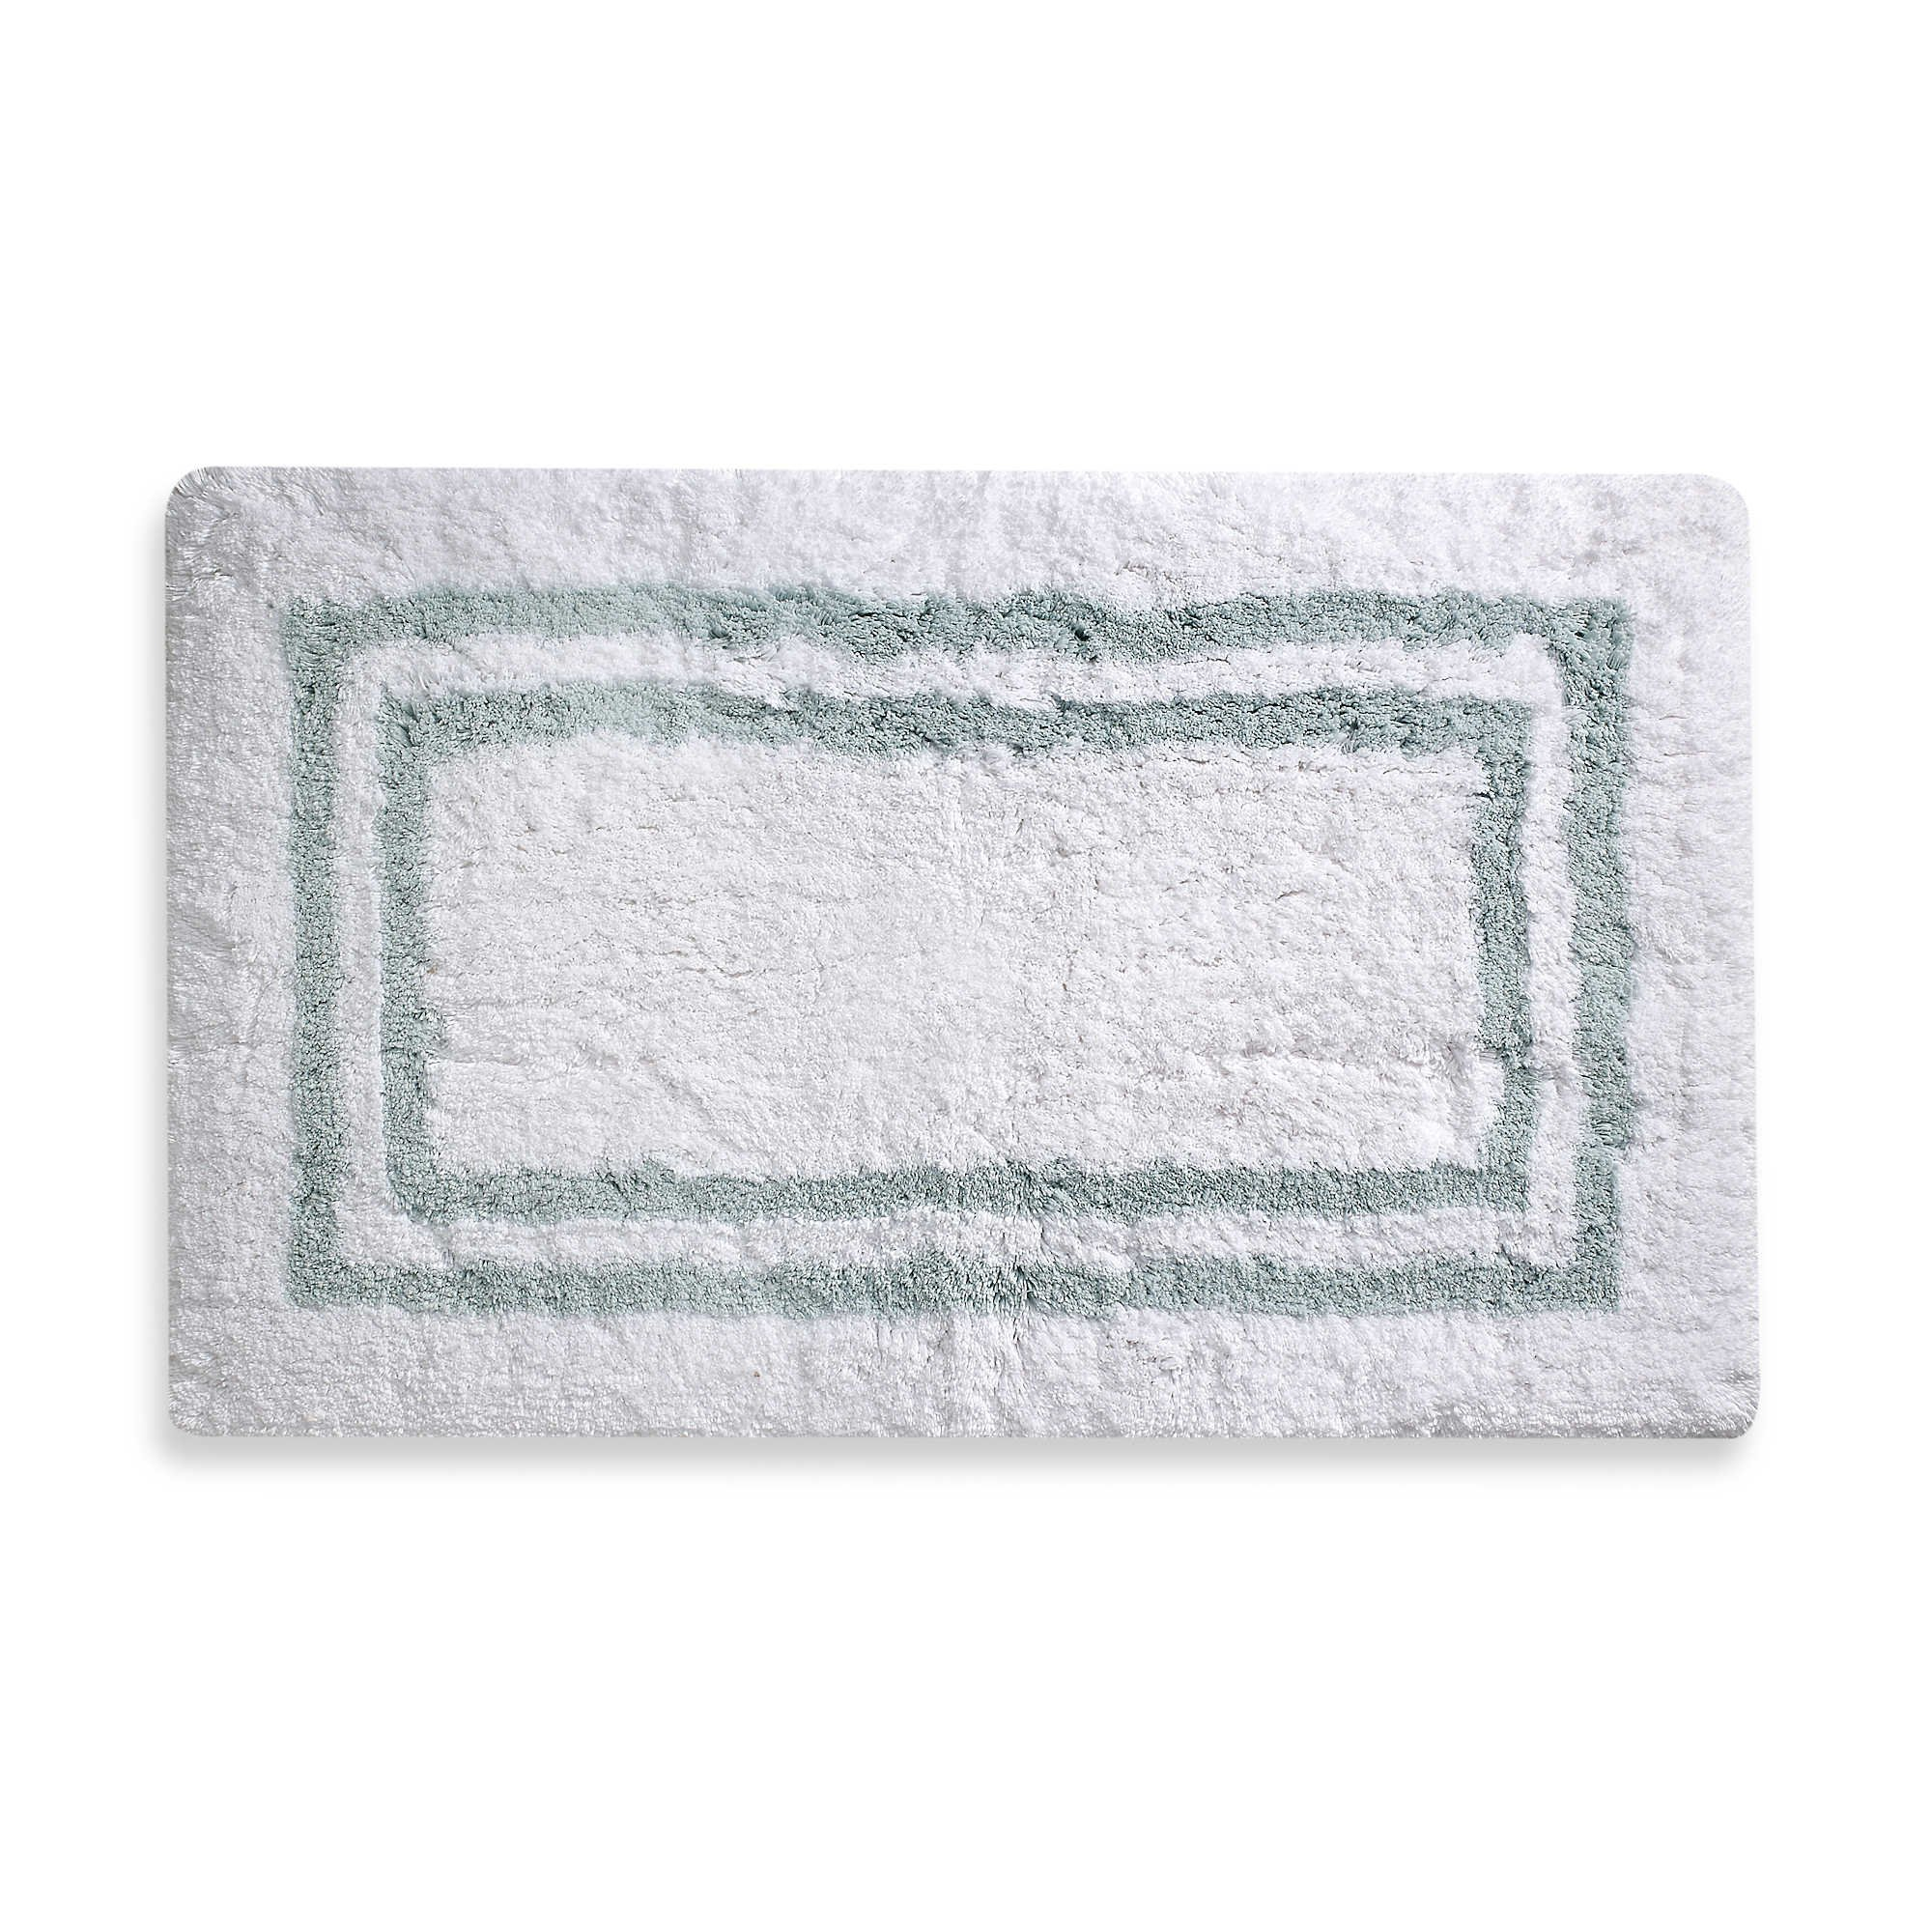 Wamsutta 21-Inch x 34-Inch Hotel Spa Rug in White/Aqua